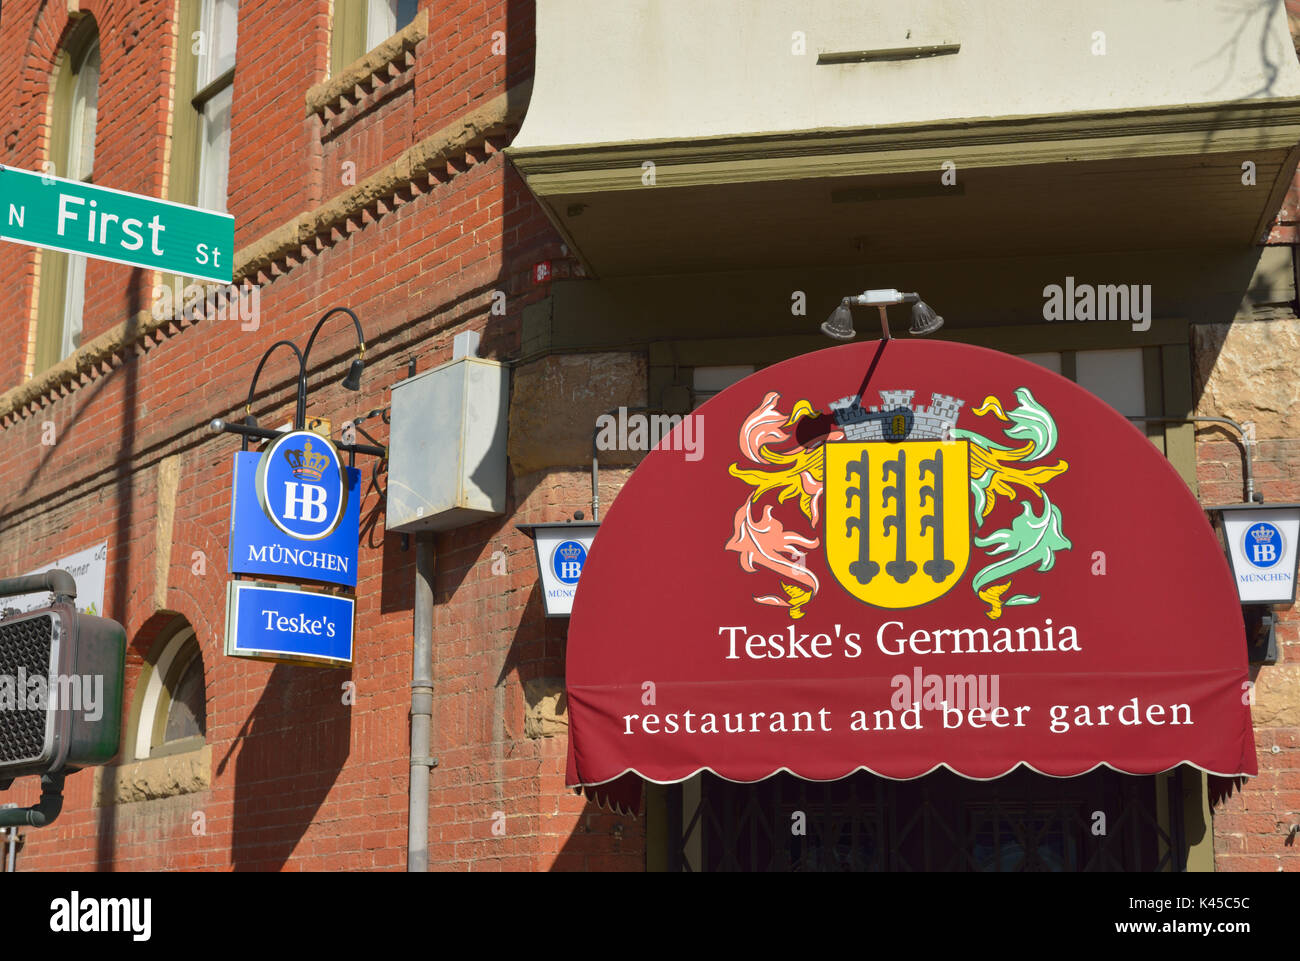 Teske S Germania Restaurant And Beer Garden San Jose Ca